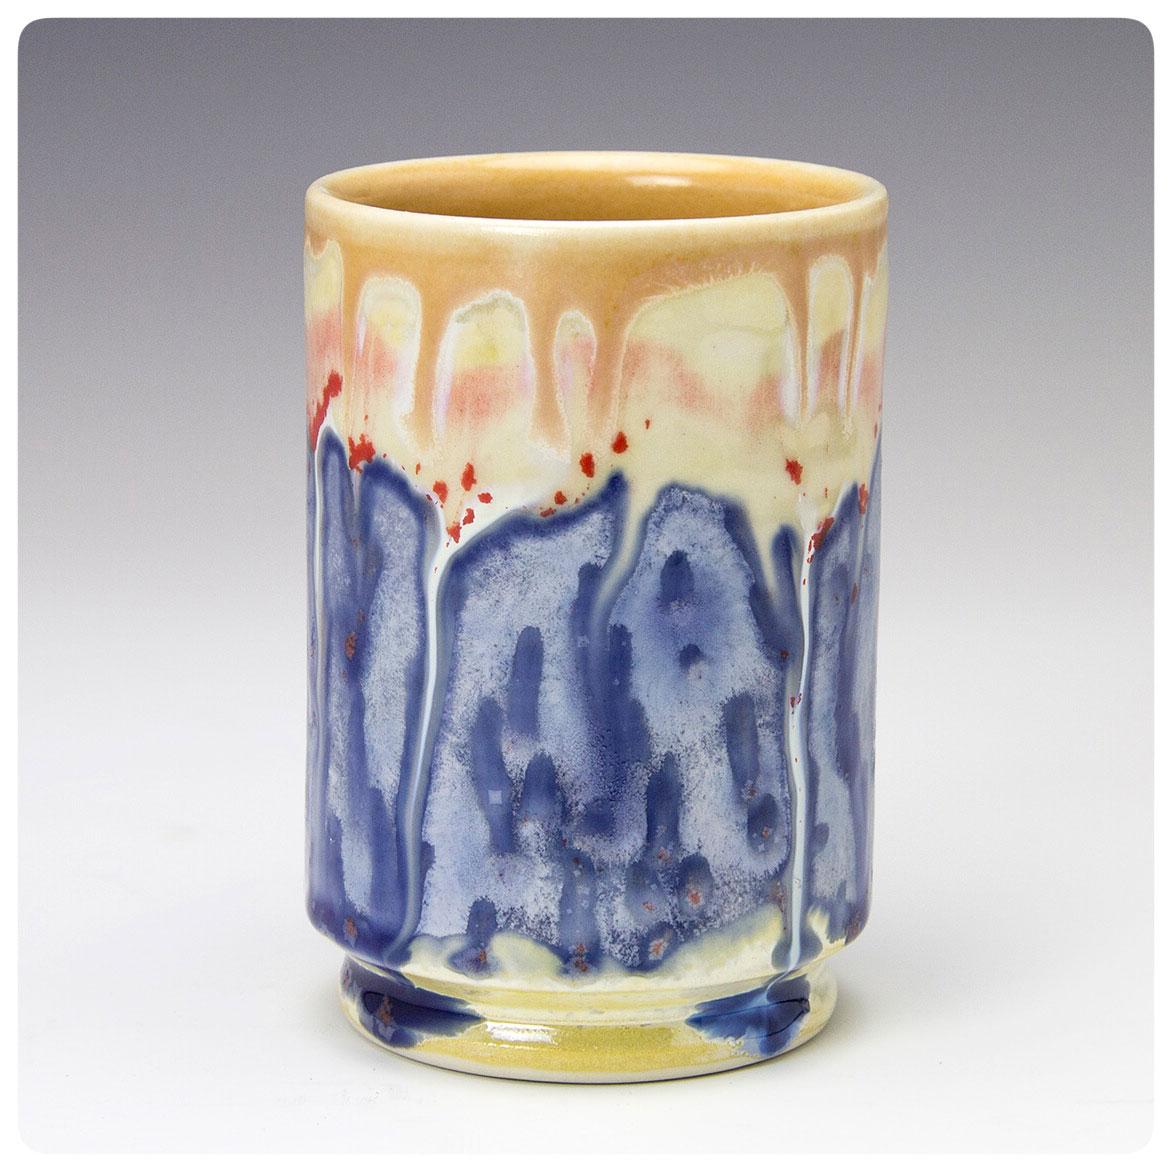 Creative Flow Art Cup made by Samantha Henneke, Bulldog Pottery, Seagrove, North Carolina